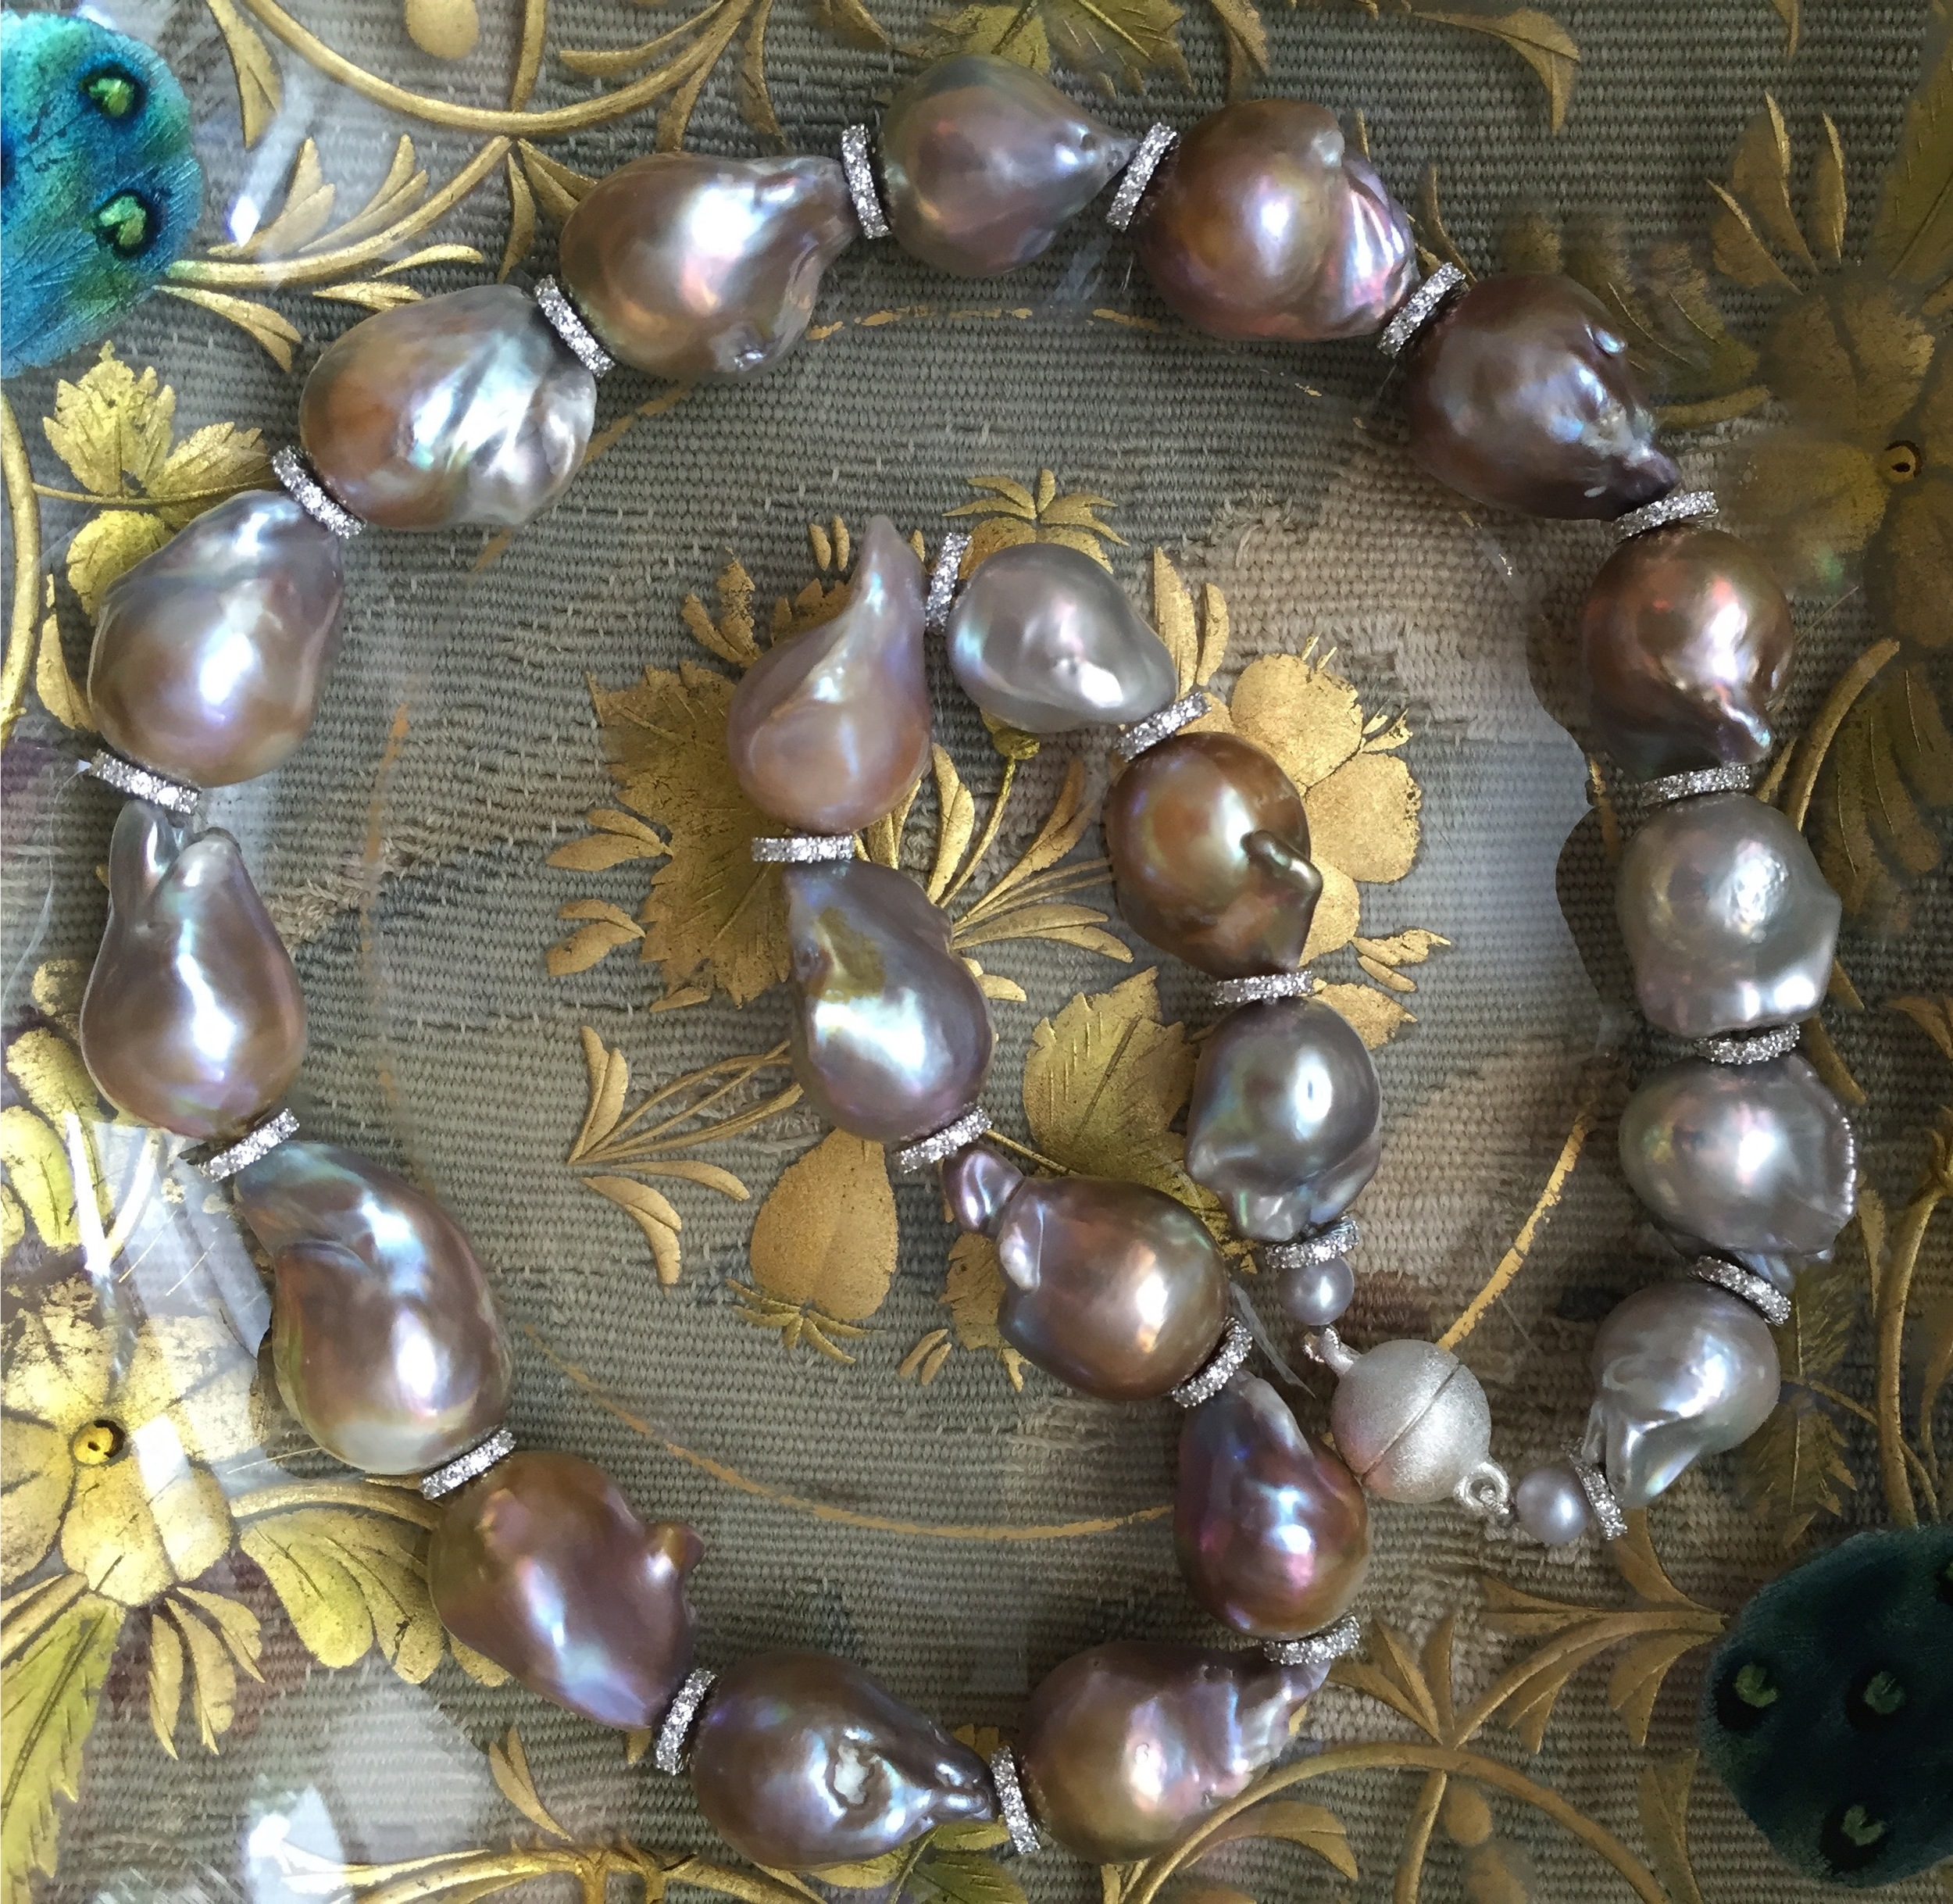 sacred-llc-keshi-pearls.jpg